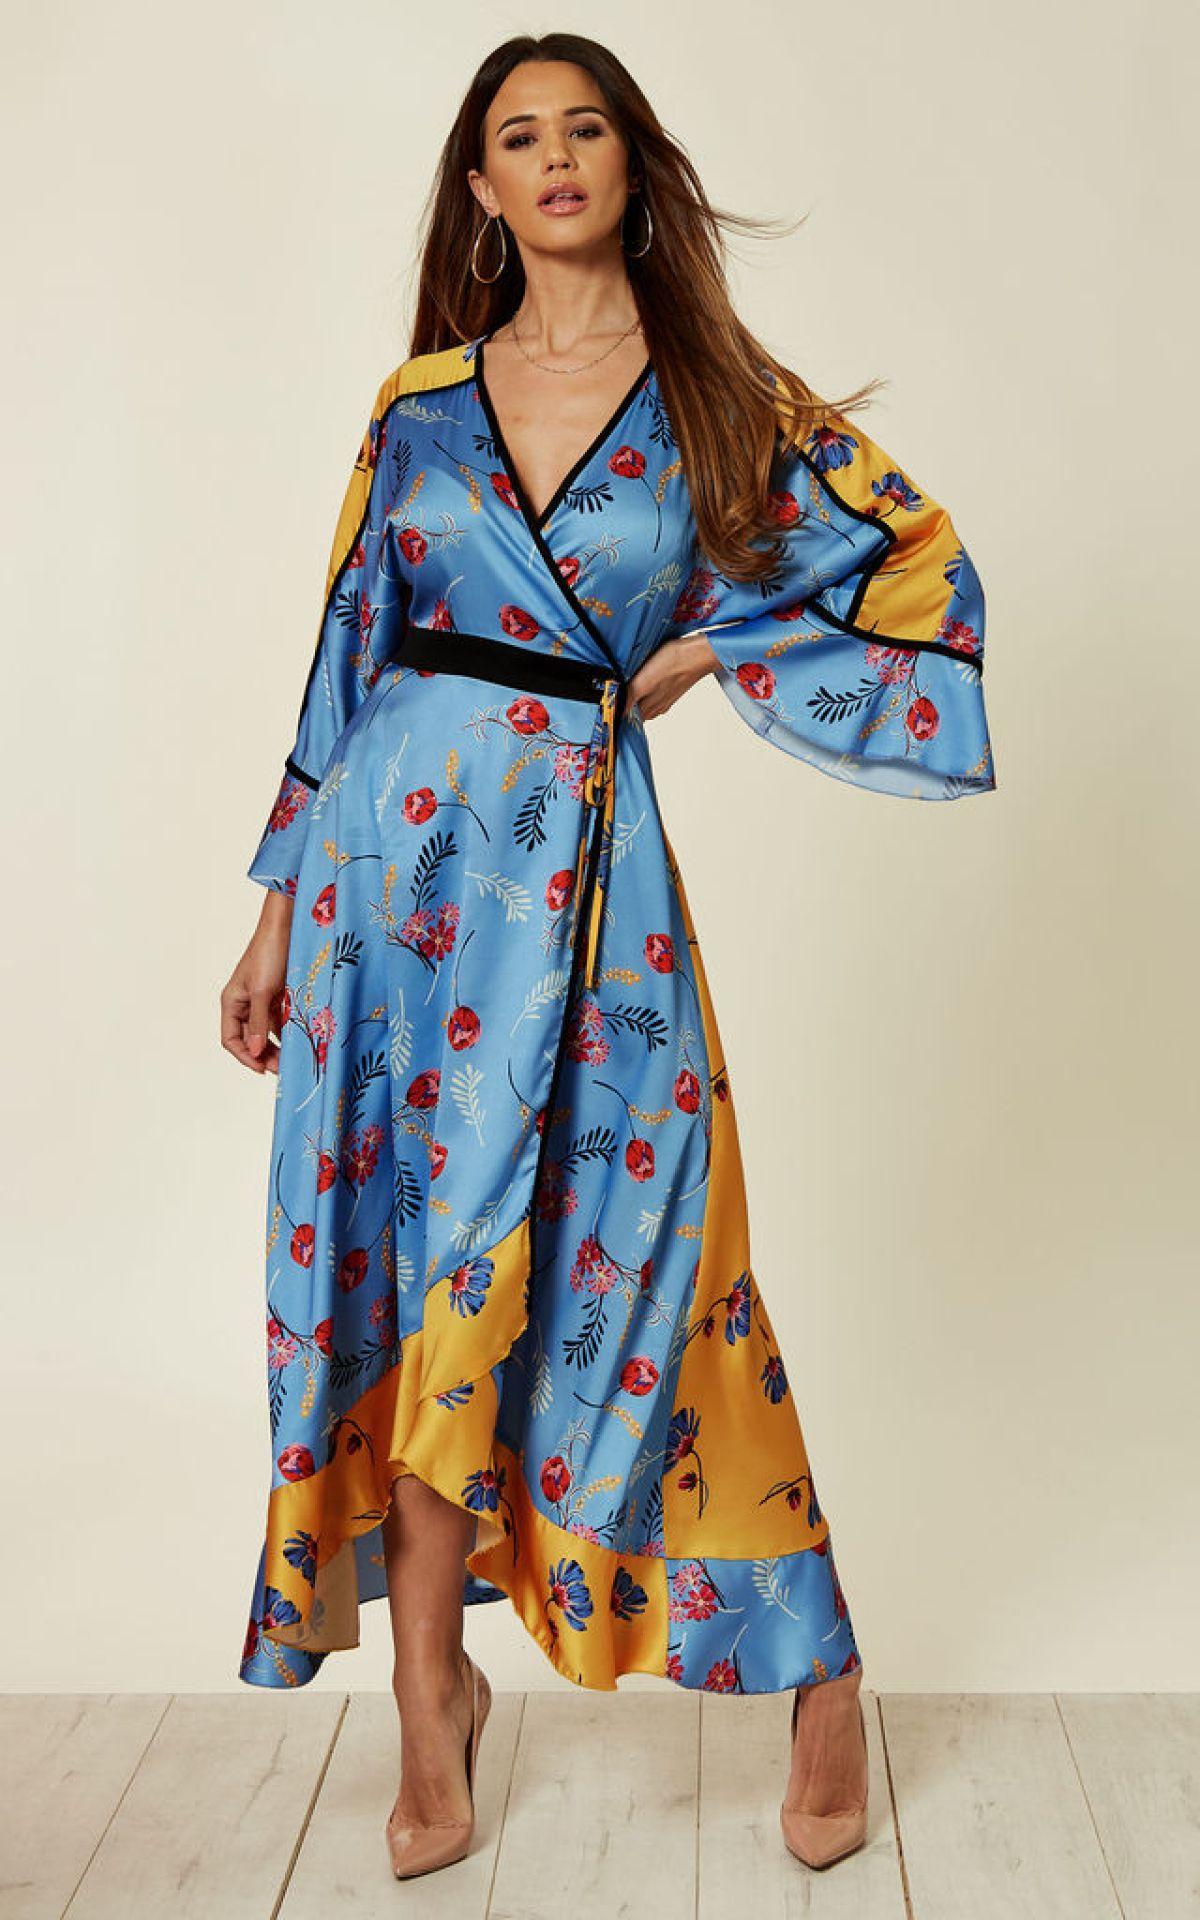 kimono-midi-dress-in-mixed-print-floral-summer-sale